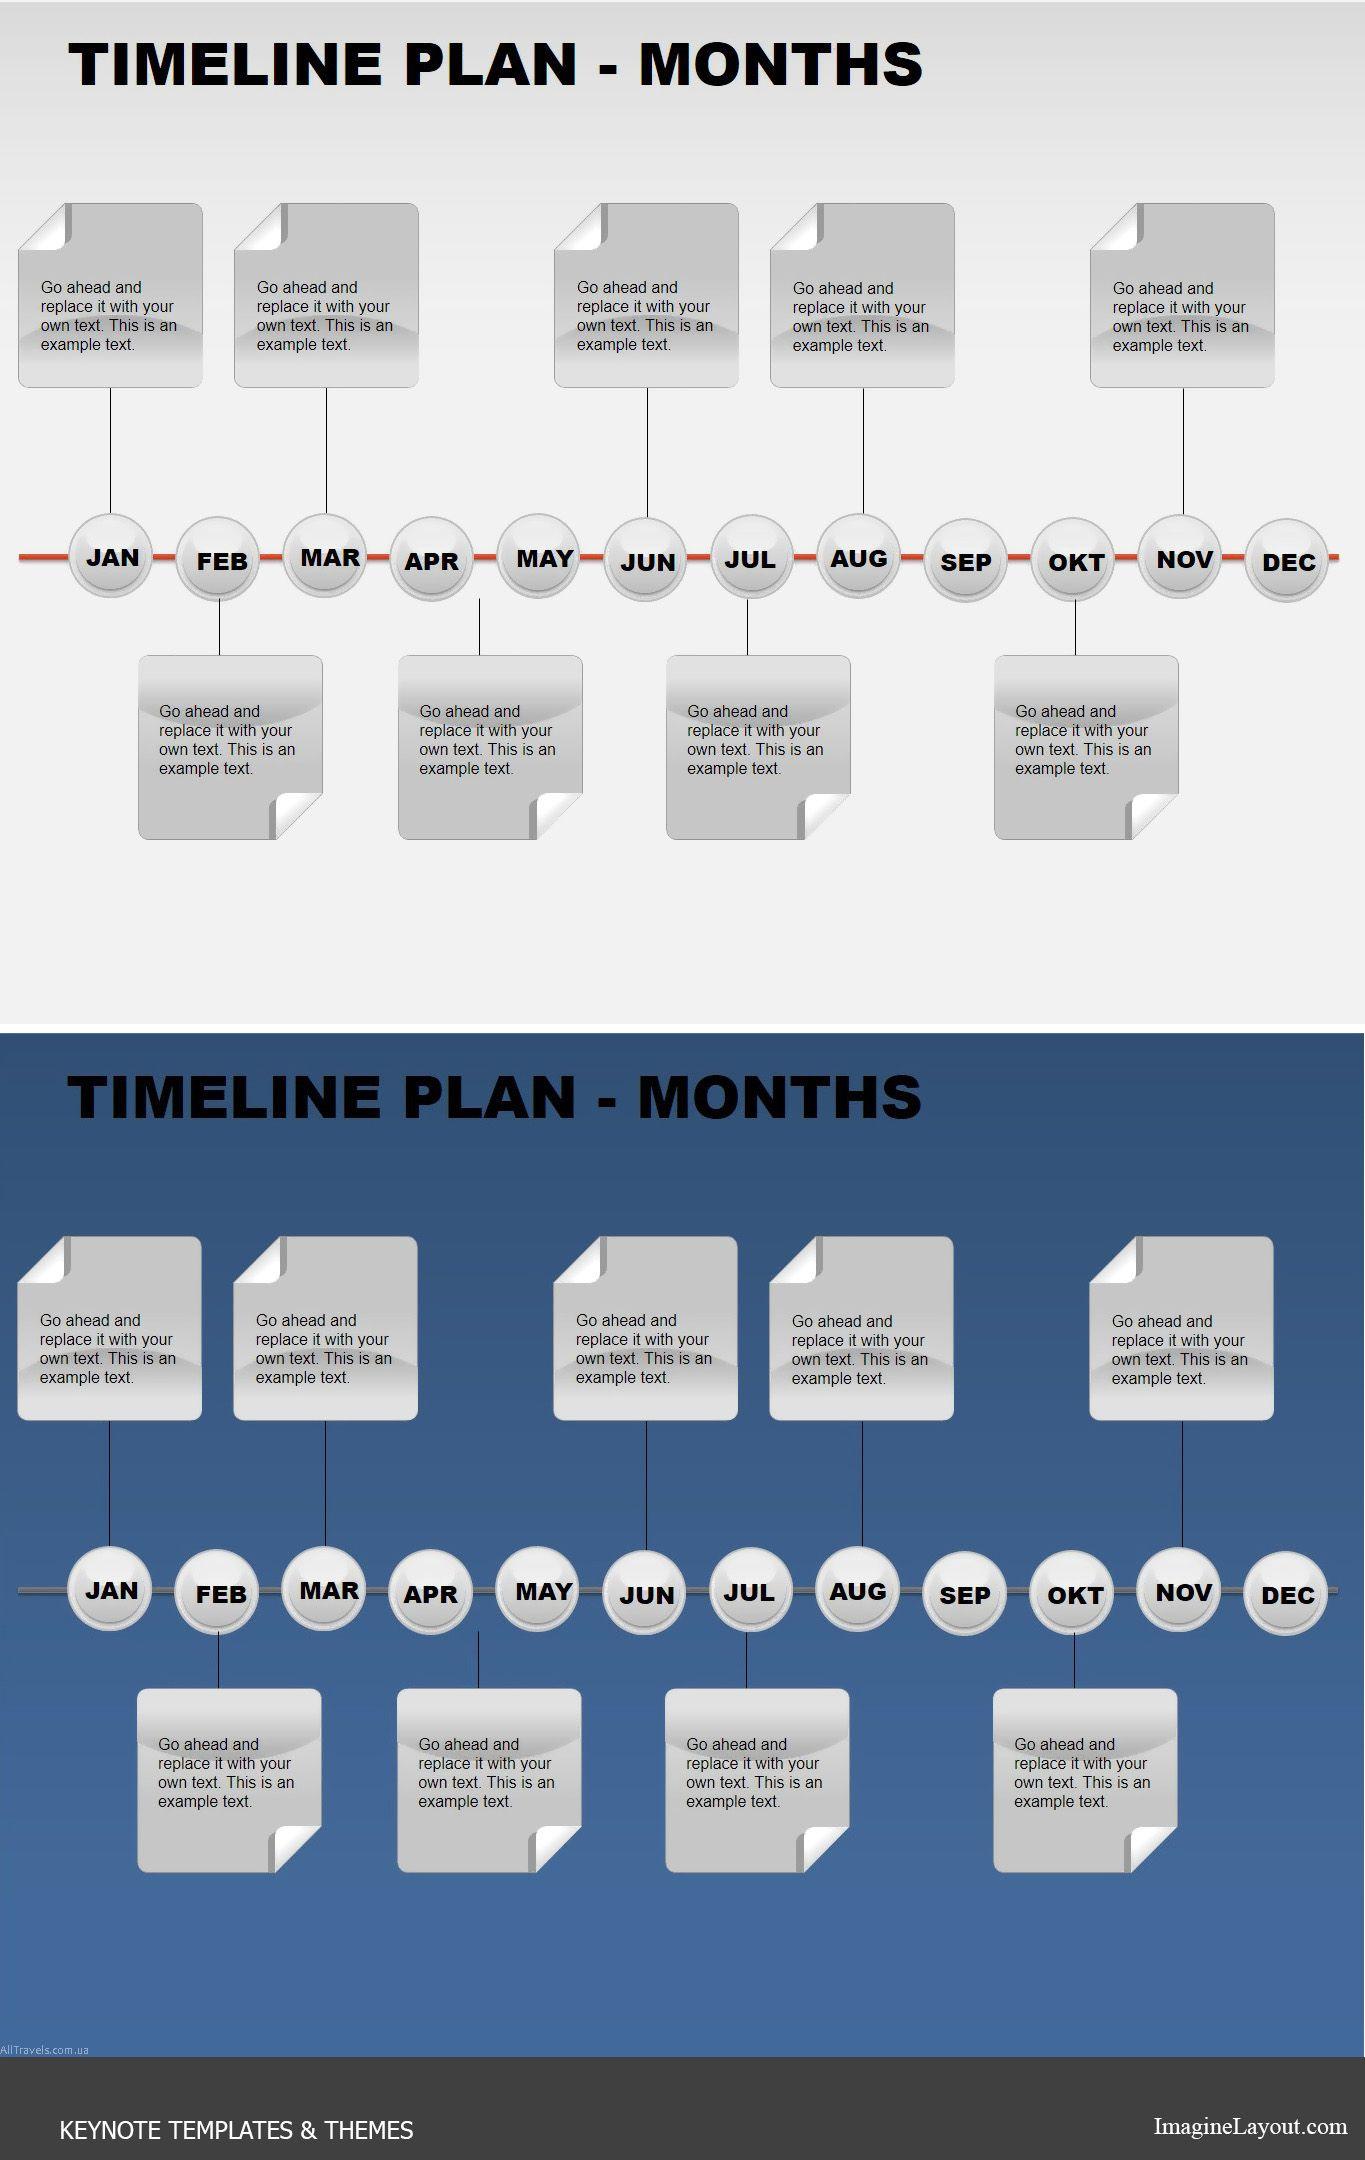 Timeline Plan Months  Keynote Charts    Keynote